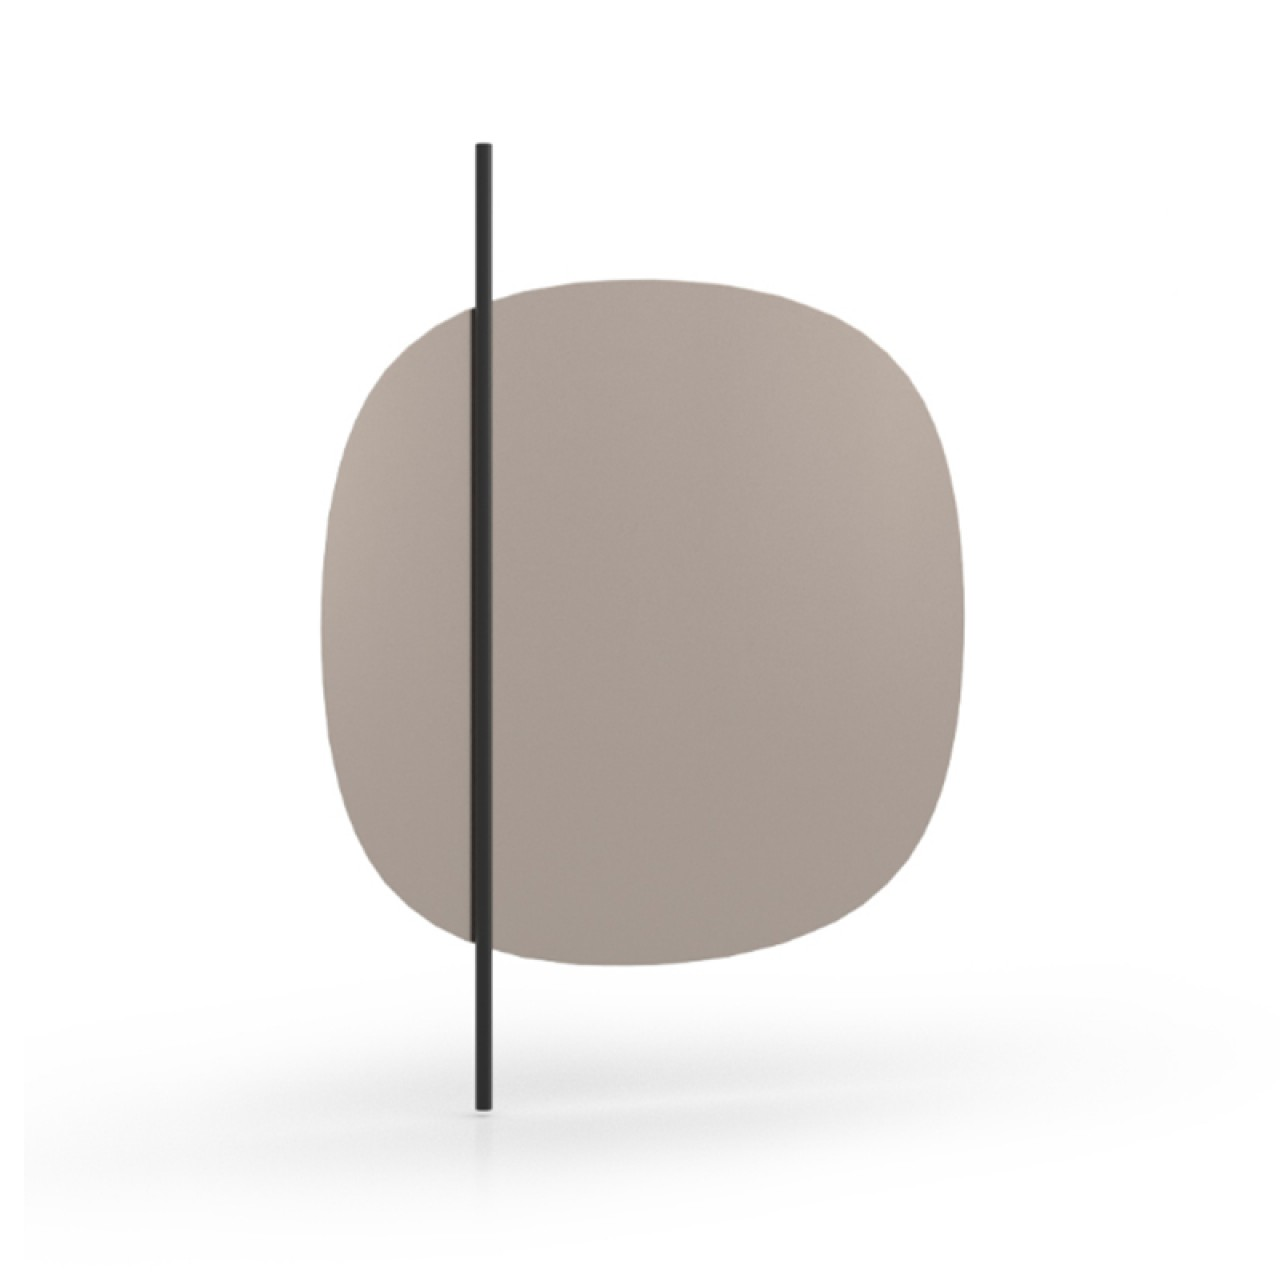 Vanity specchio complementi d 39 arredo torino for Complementi d arredo torino